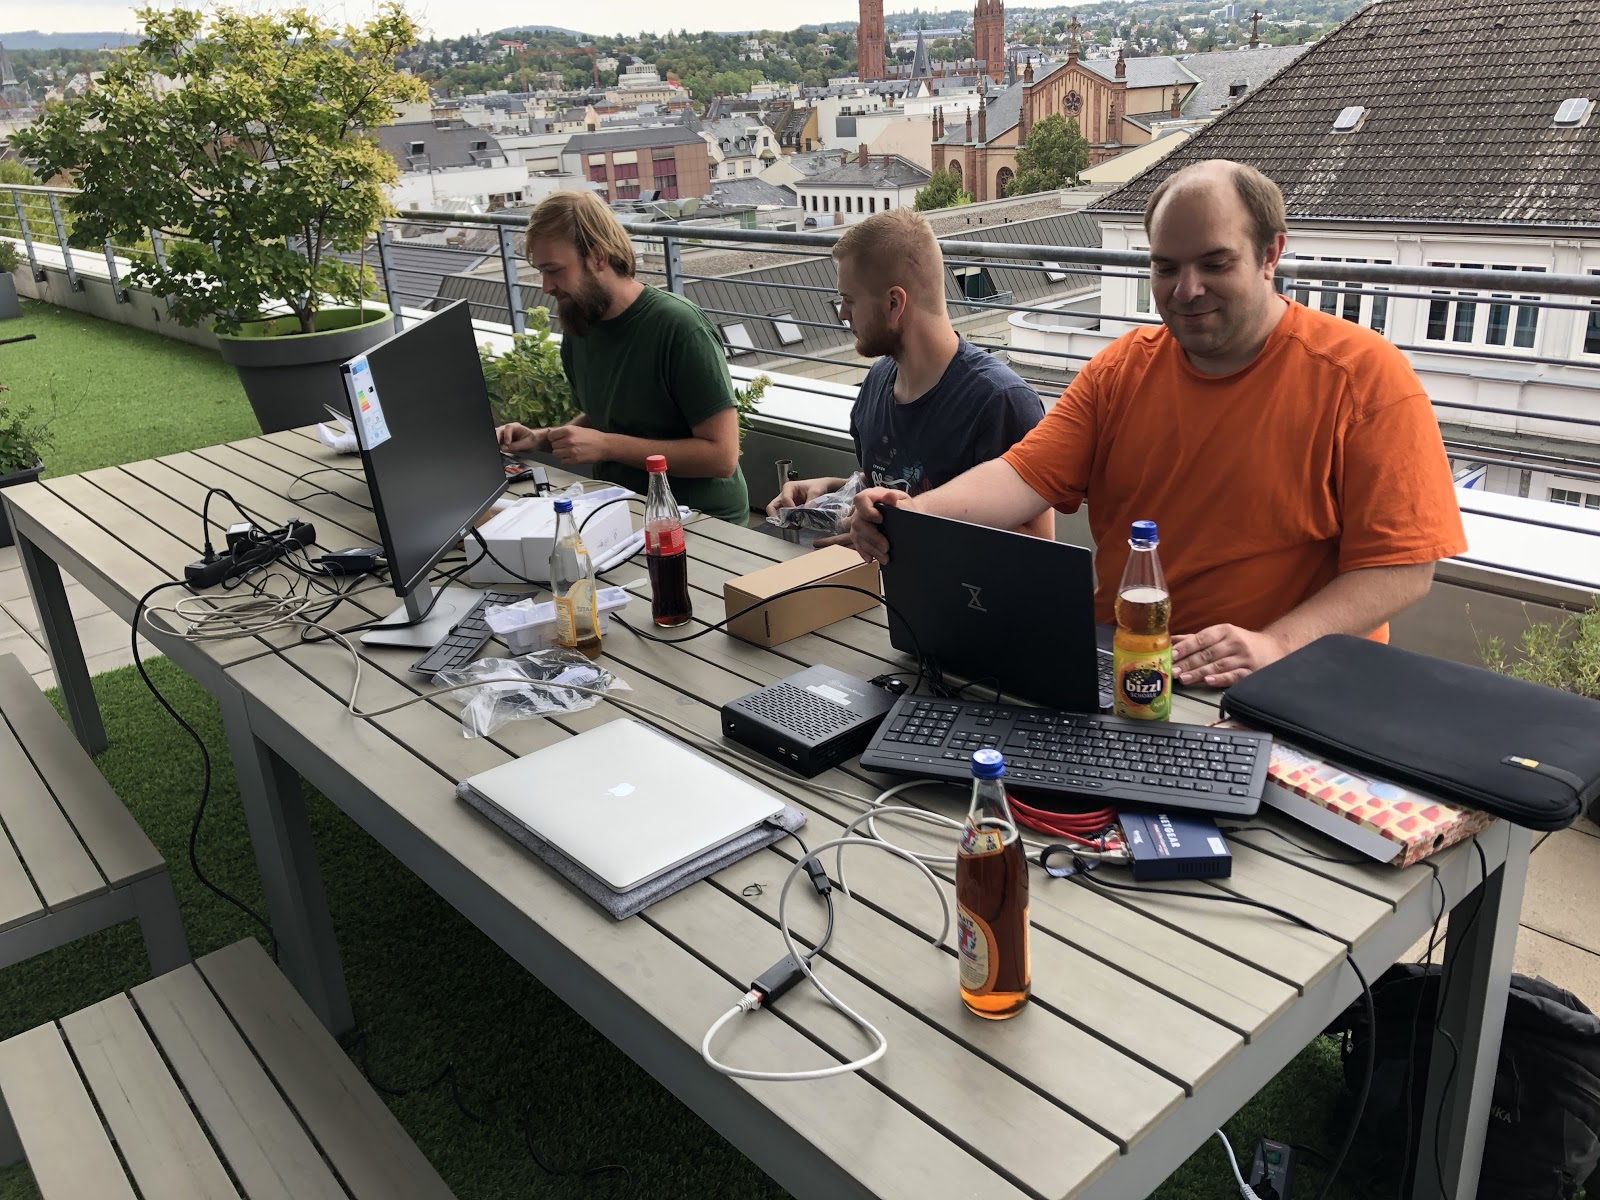 Setting up the free community Wi-Fi